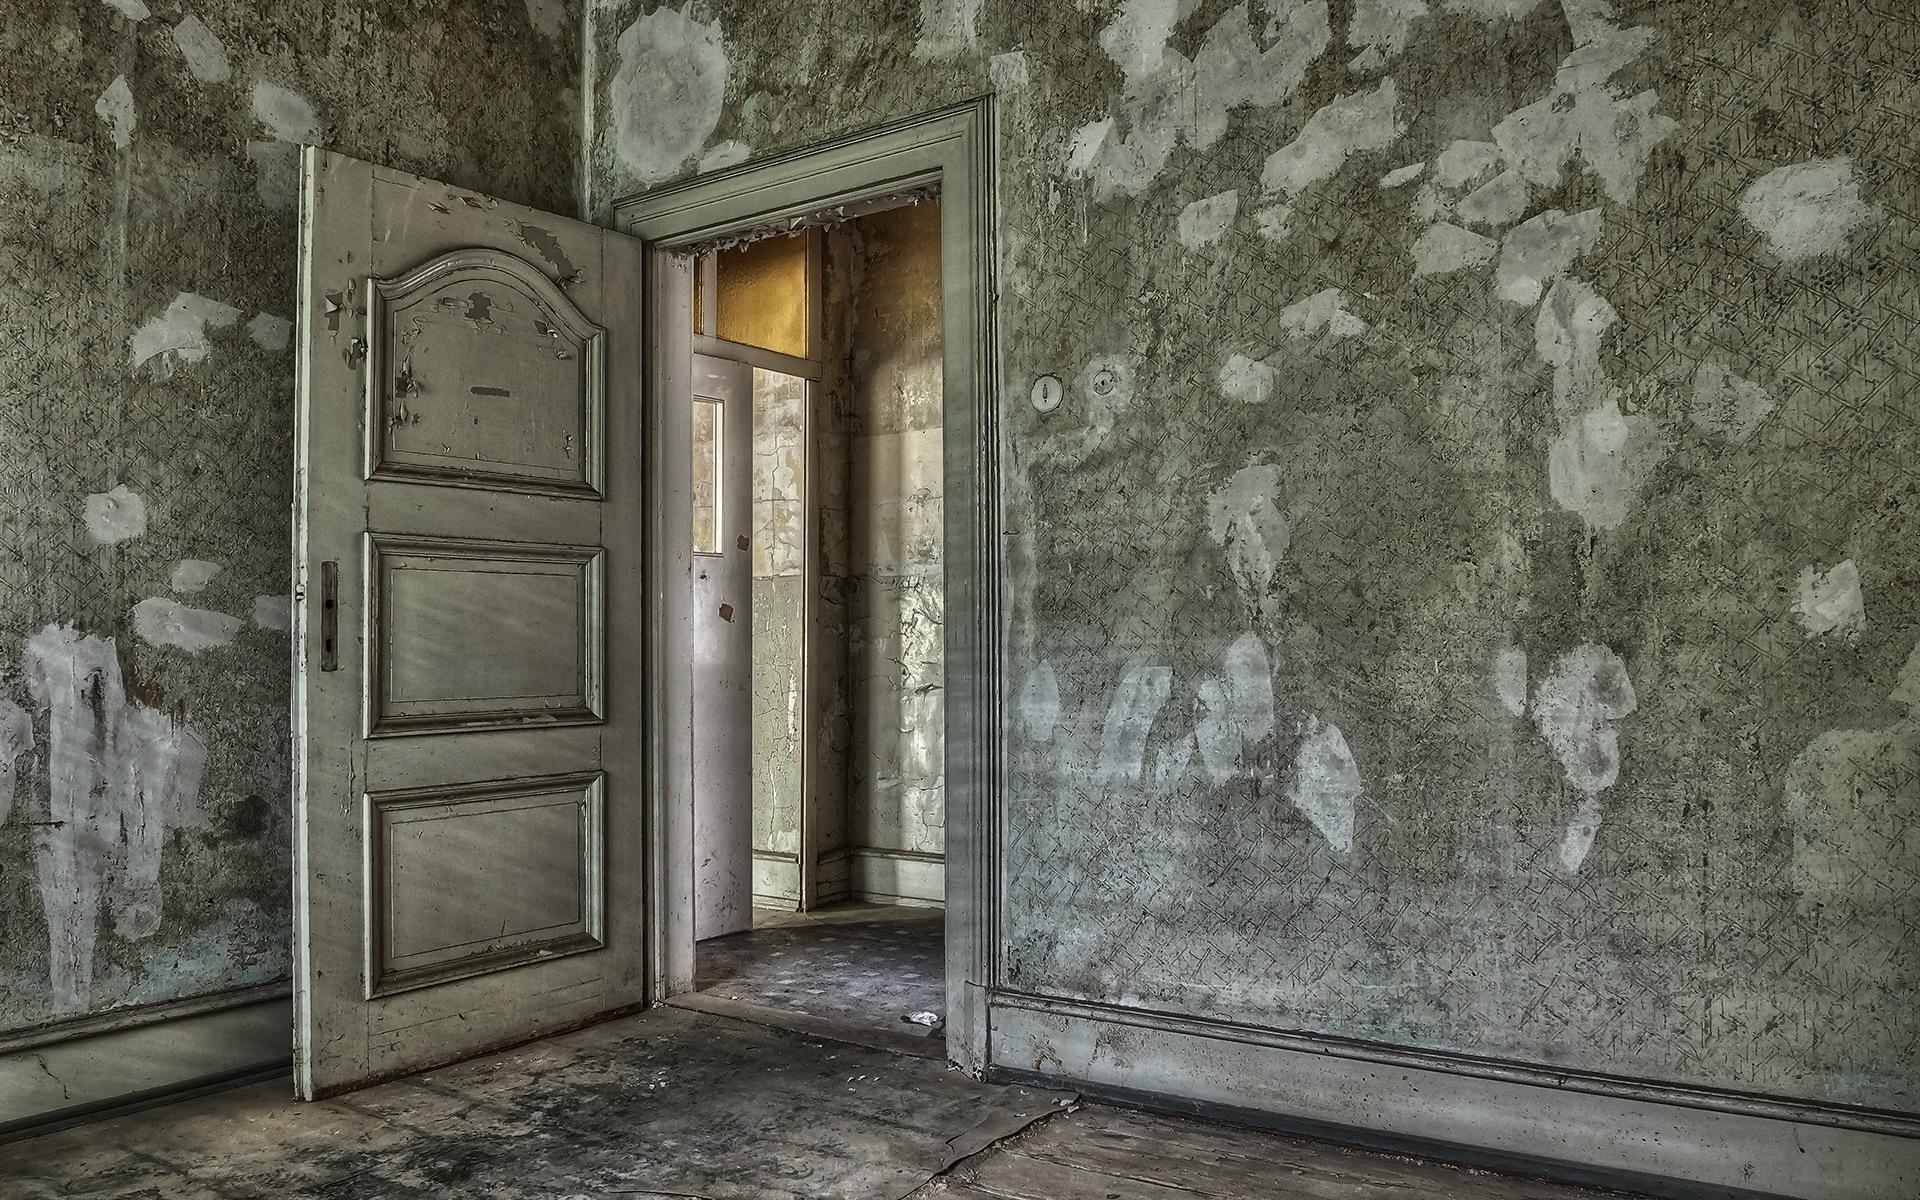 девочек комната с дверями на картинке николаевич просто